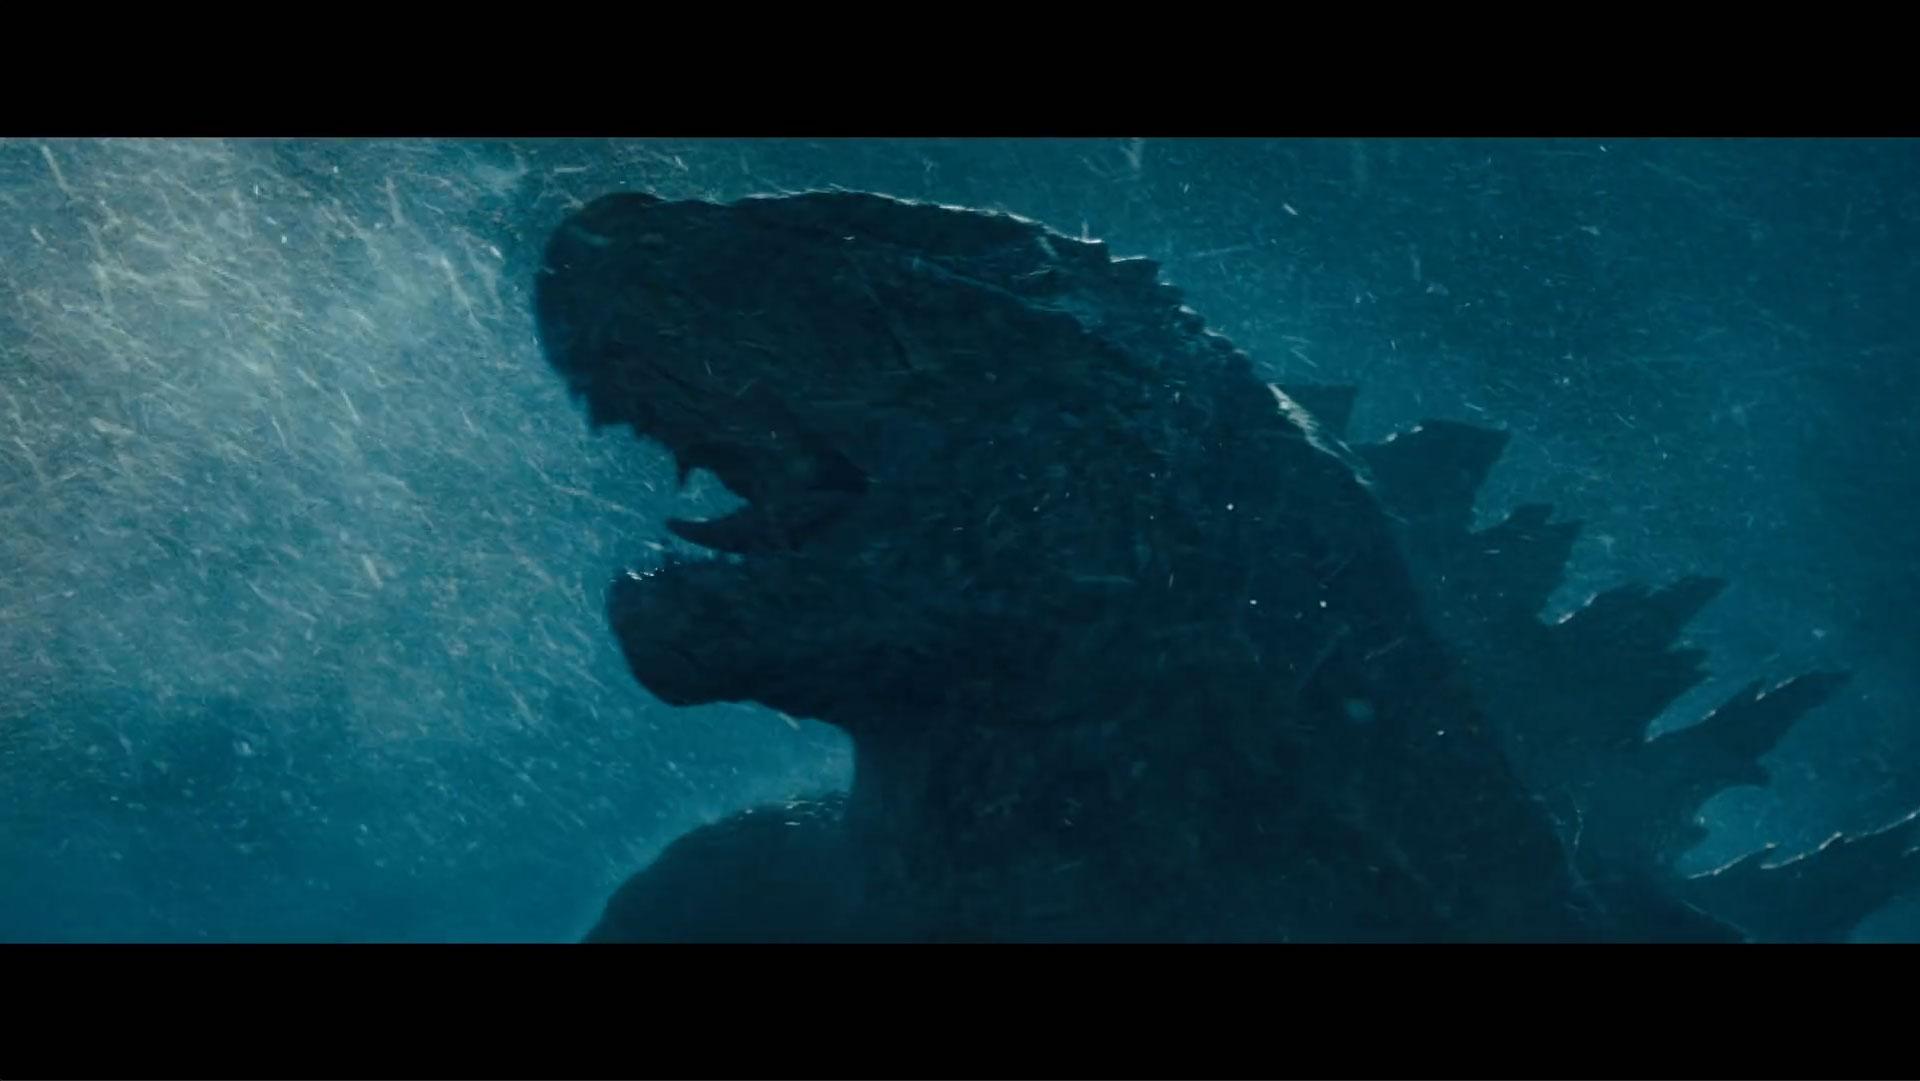 GODZILLA: KING OF MONSTERS - The Art of VFXThe Art of VFX